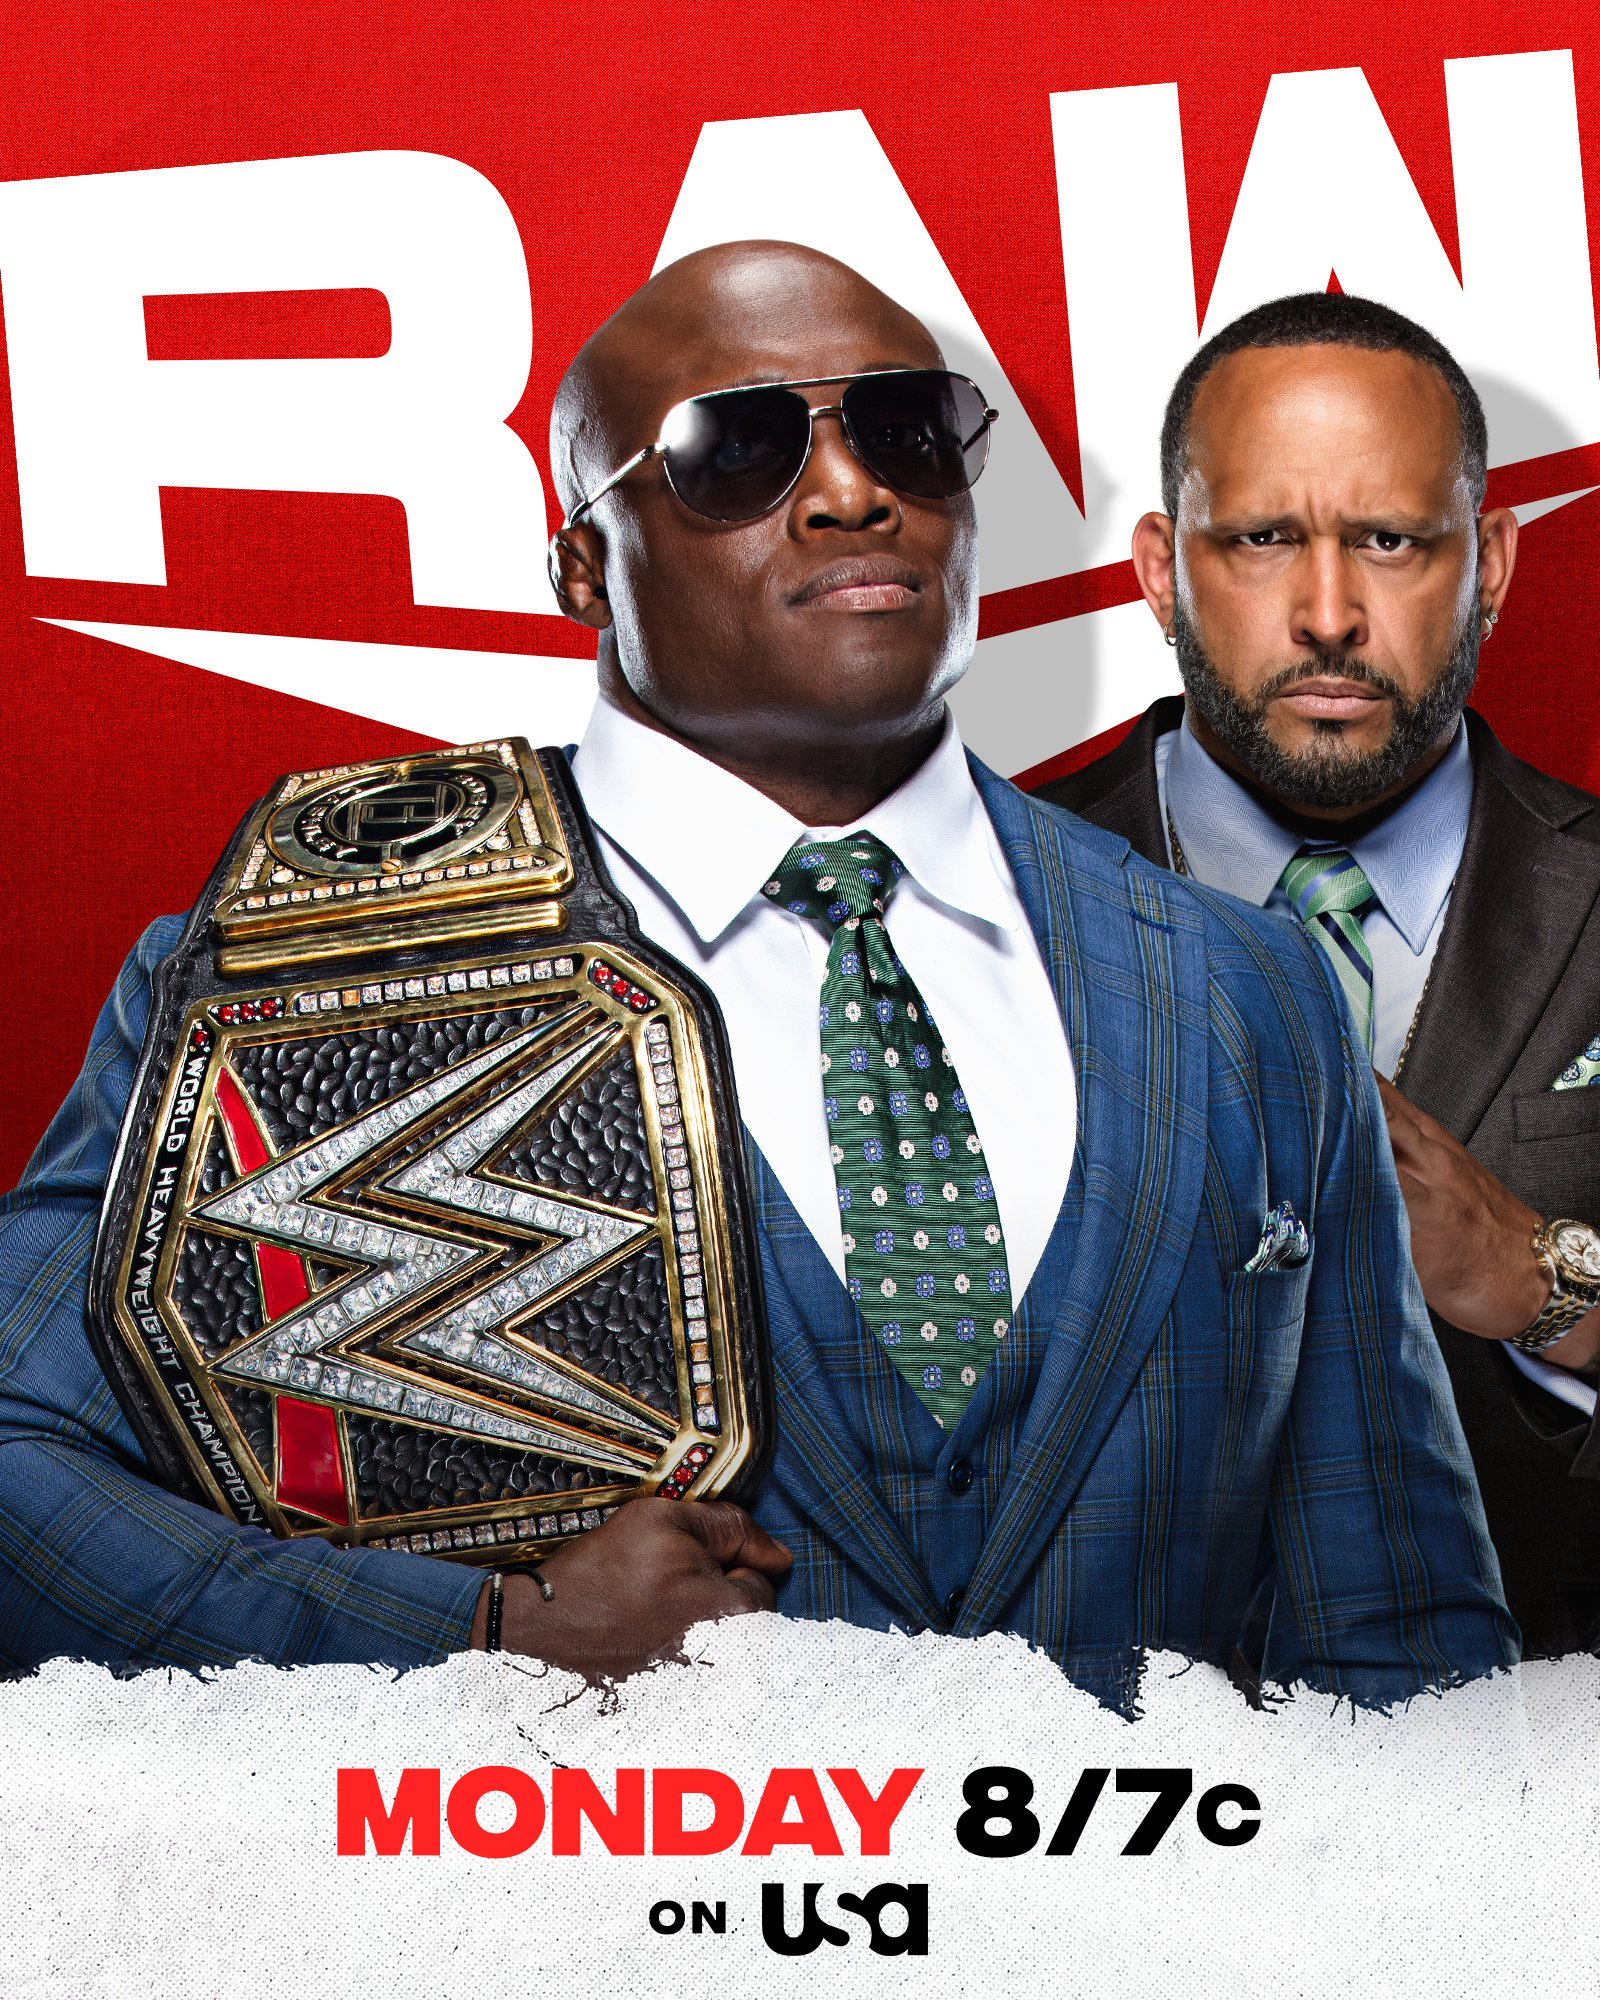 WWE Raw Preview (09/08/21): Bobby Lashley, Charlotte Flair Responds 16